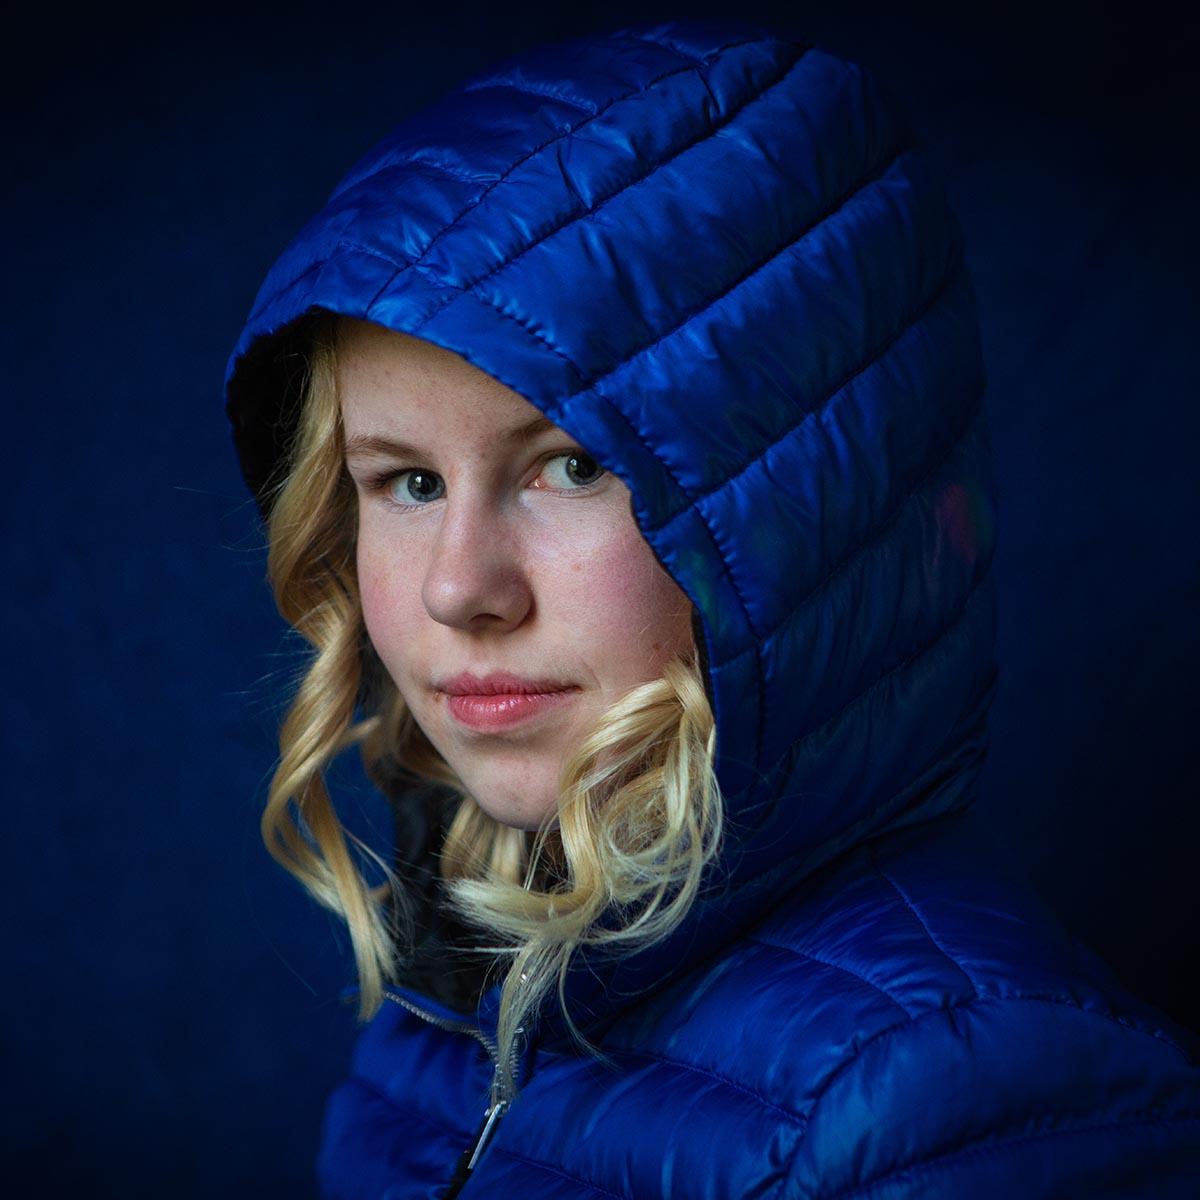 portretfoto_dochter_puber_studioportret_maarssen-9897-2